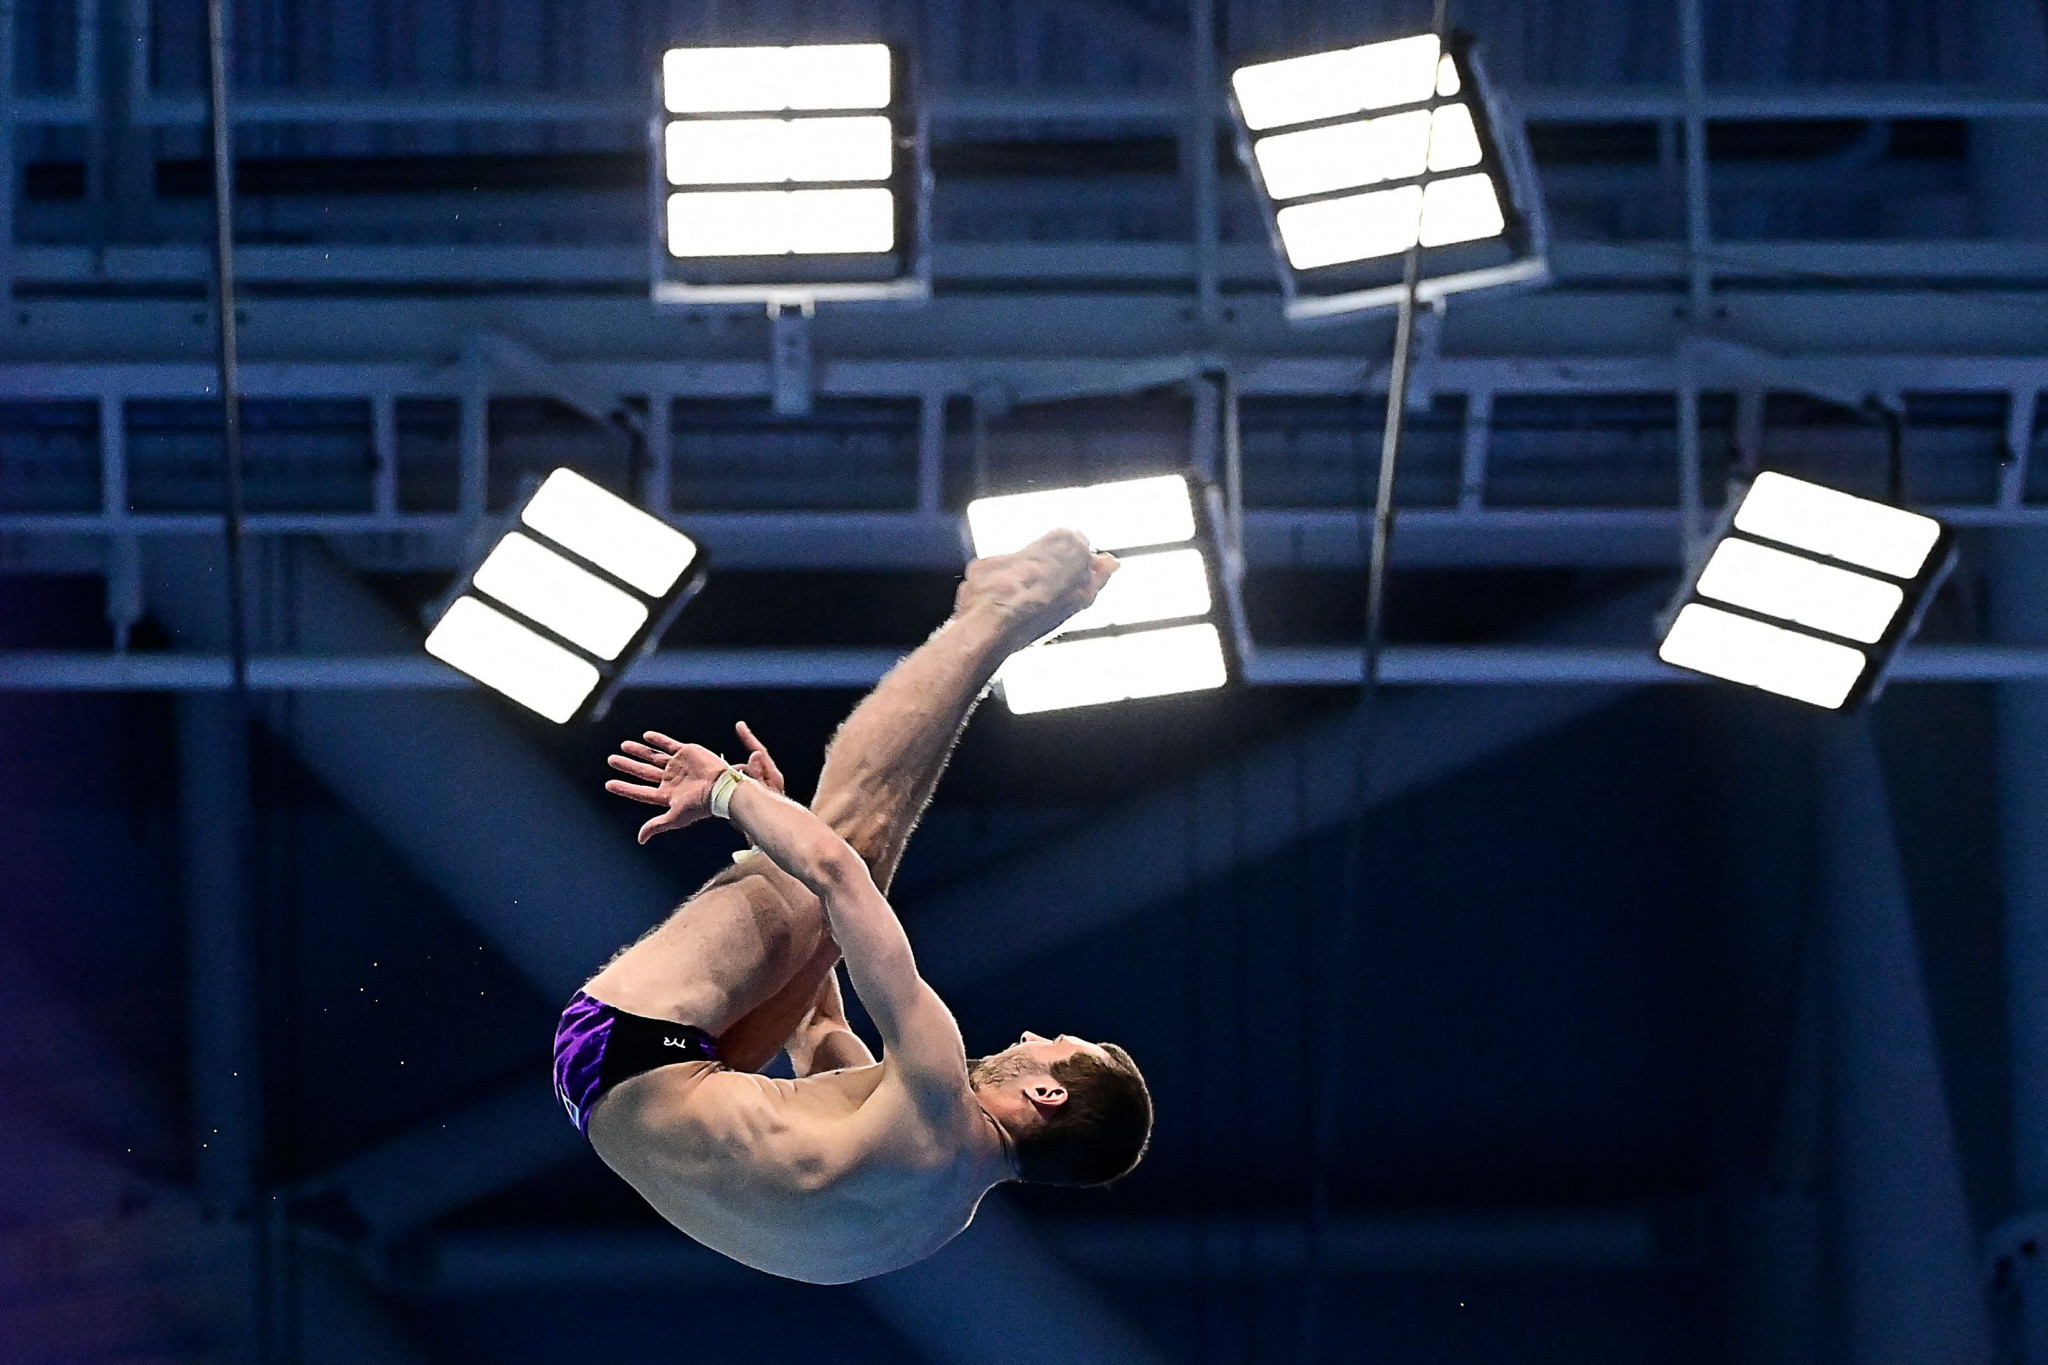 Aleksandr Bondar won a second medal of the European Aquatics Championships today ©Getty Images